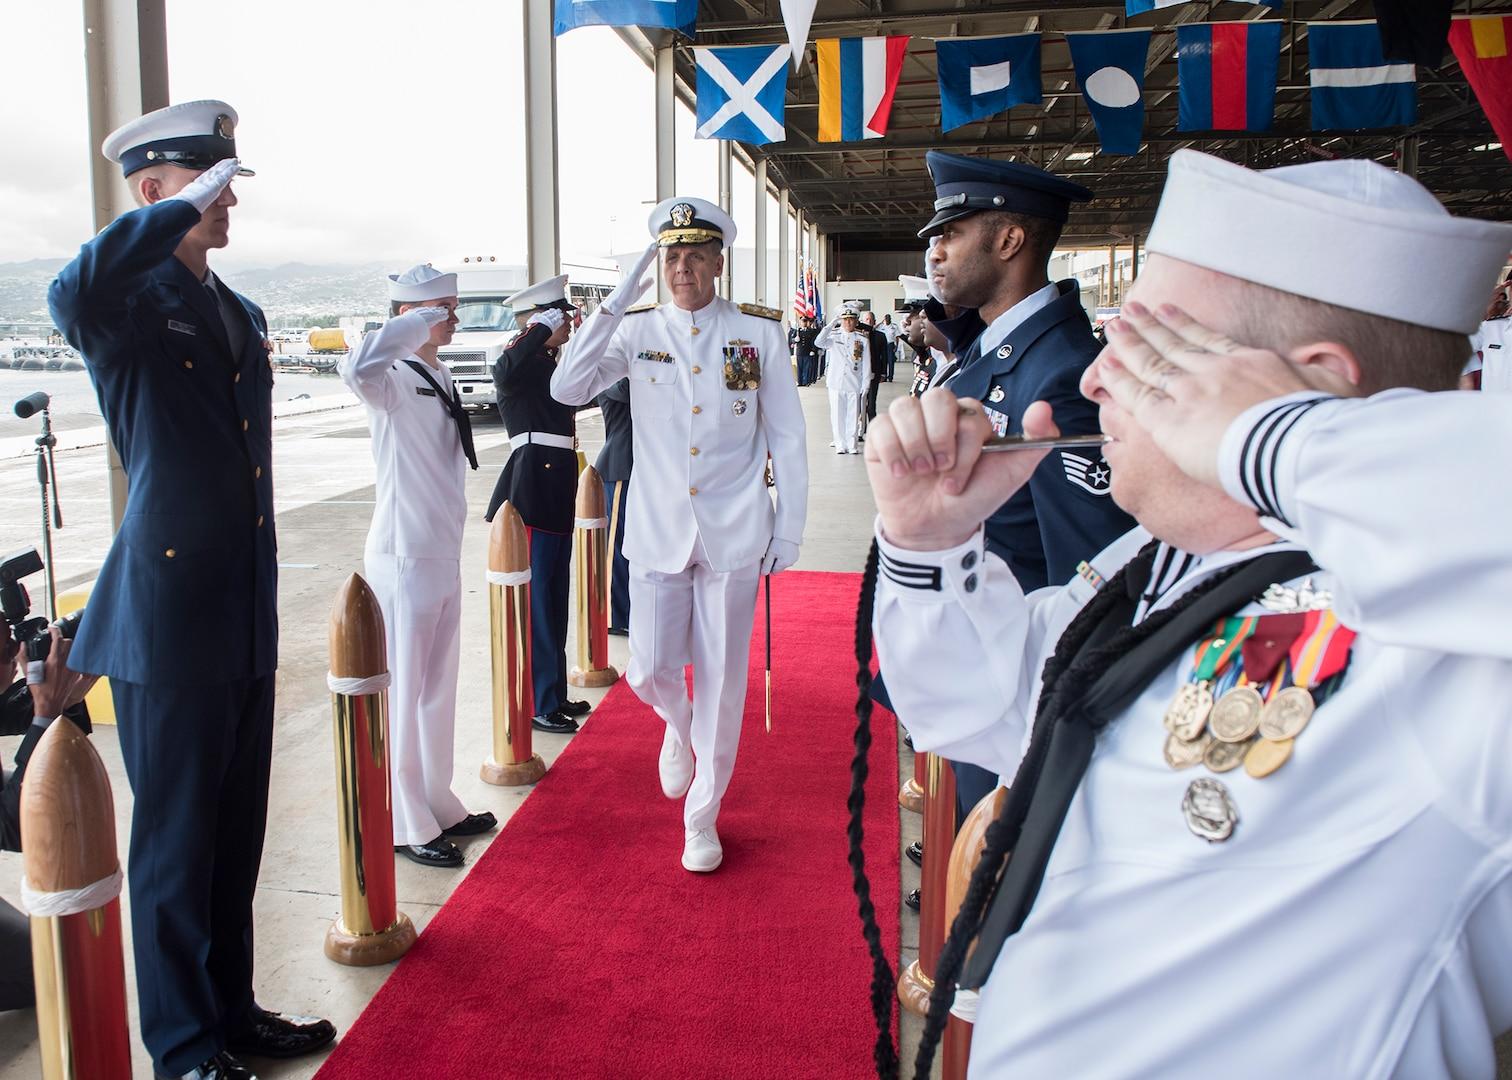 Adm. Davidson Piped Aboard as 25th Commander, U.S. Indo-Pacific Command